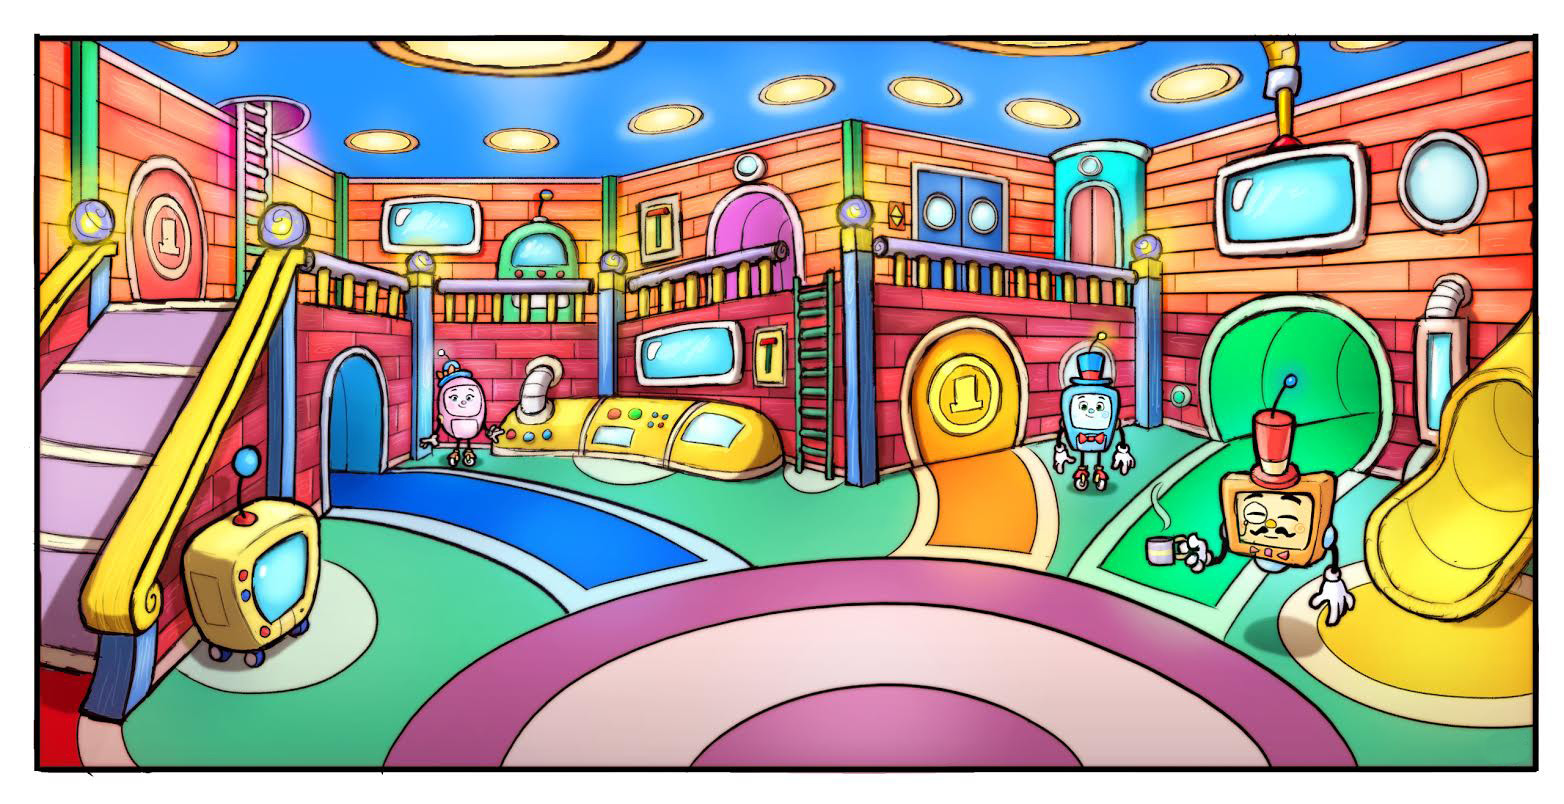 Hat Kid's Spaceship - Main Room Hub